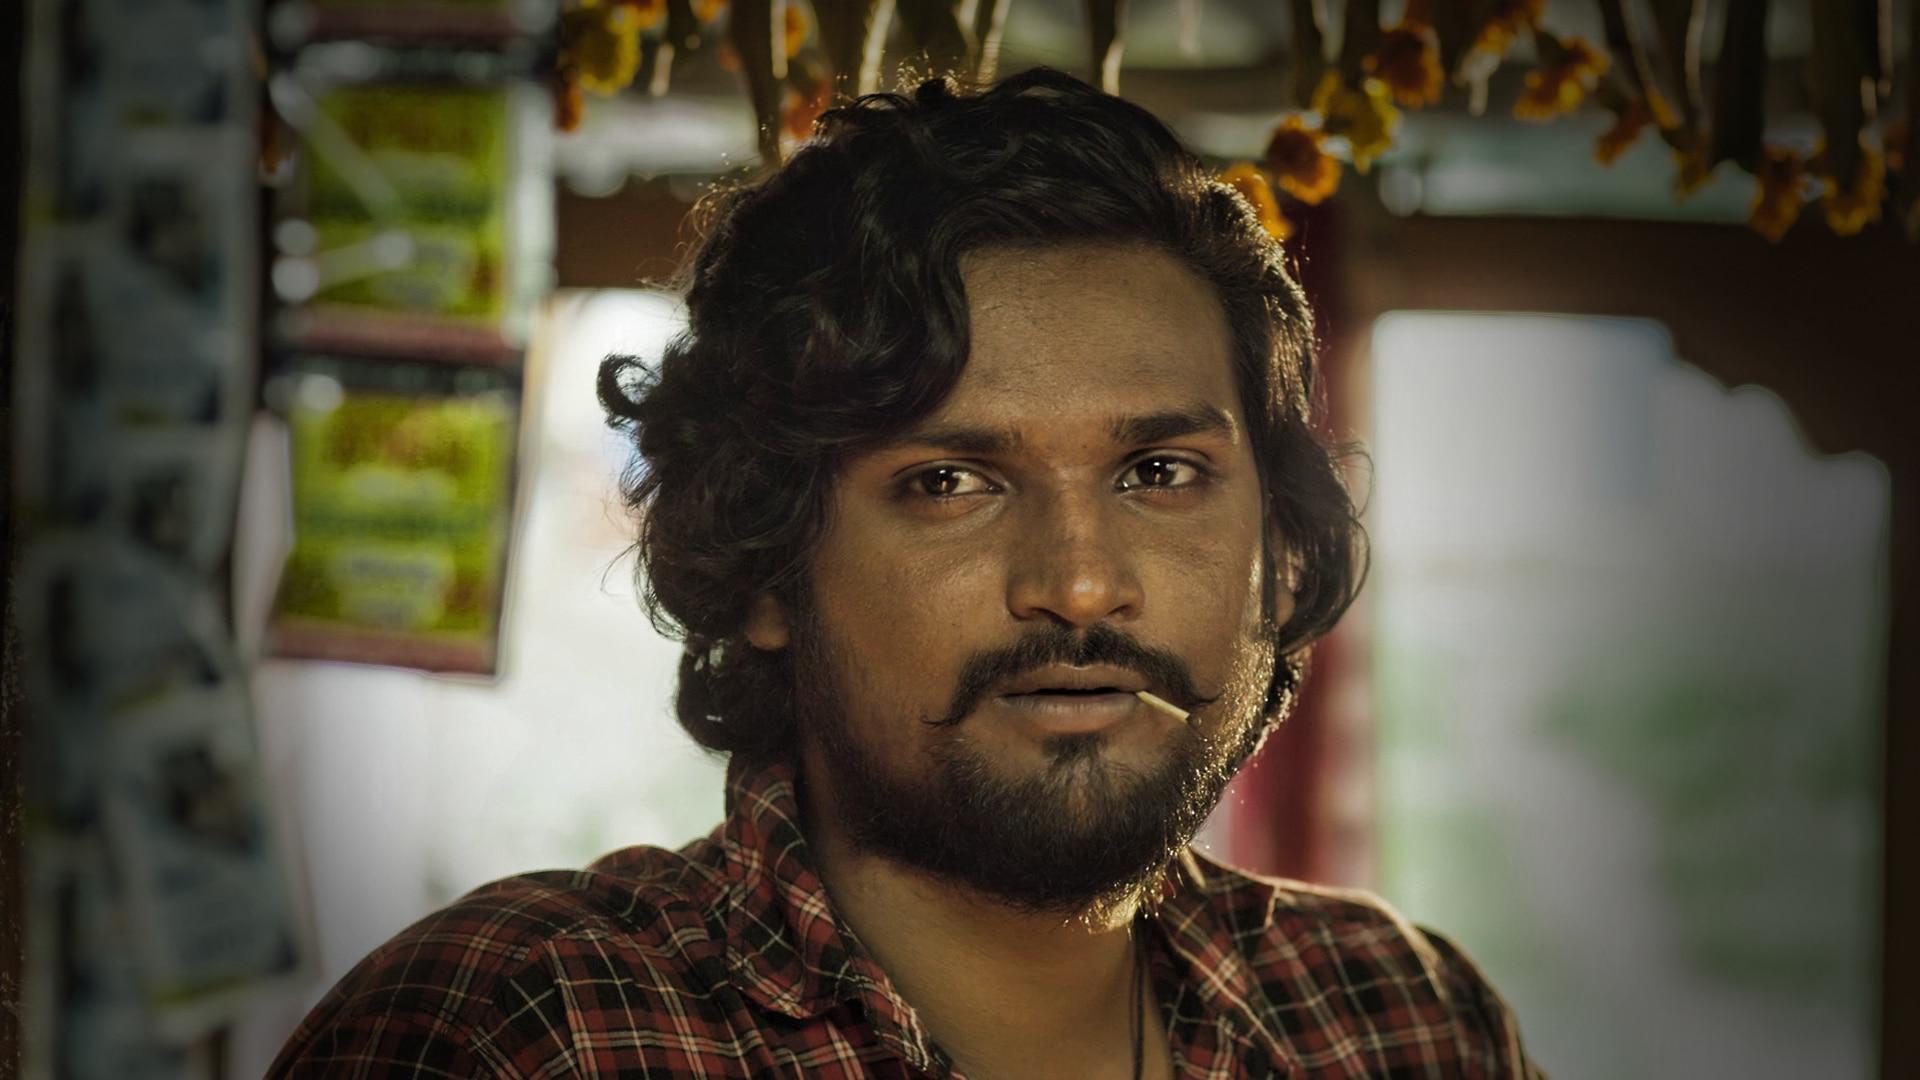 Telugu Webseries based on Portraying Village Life